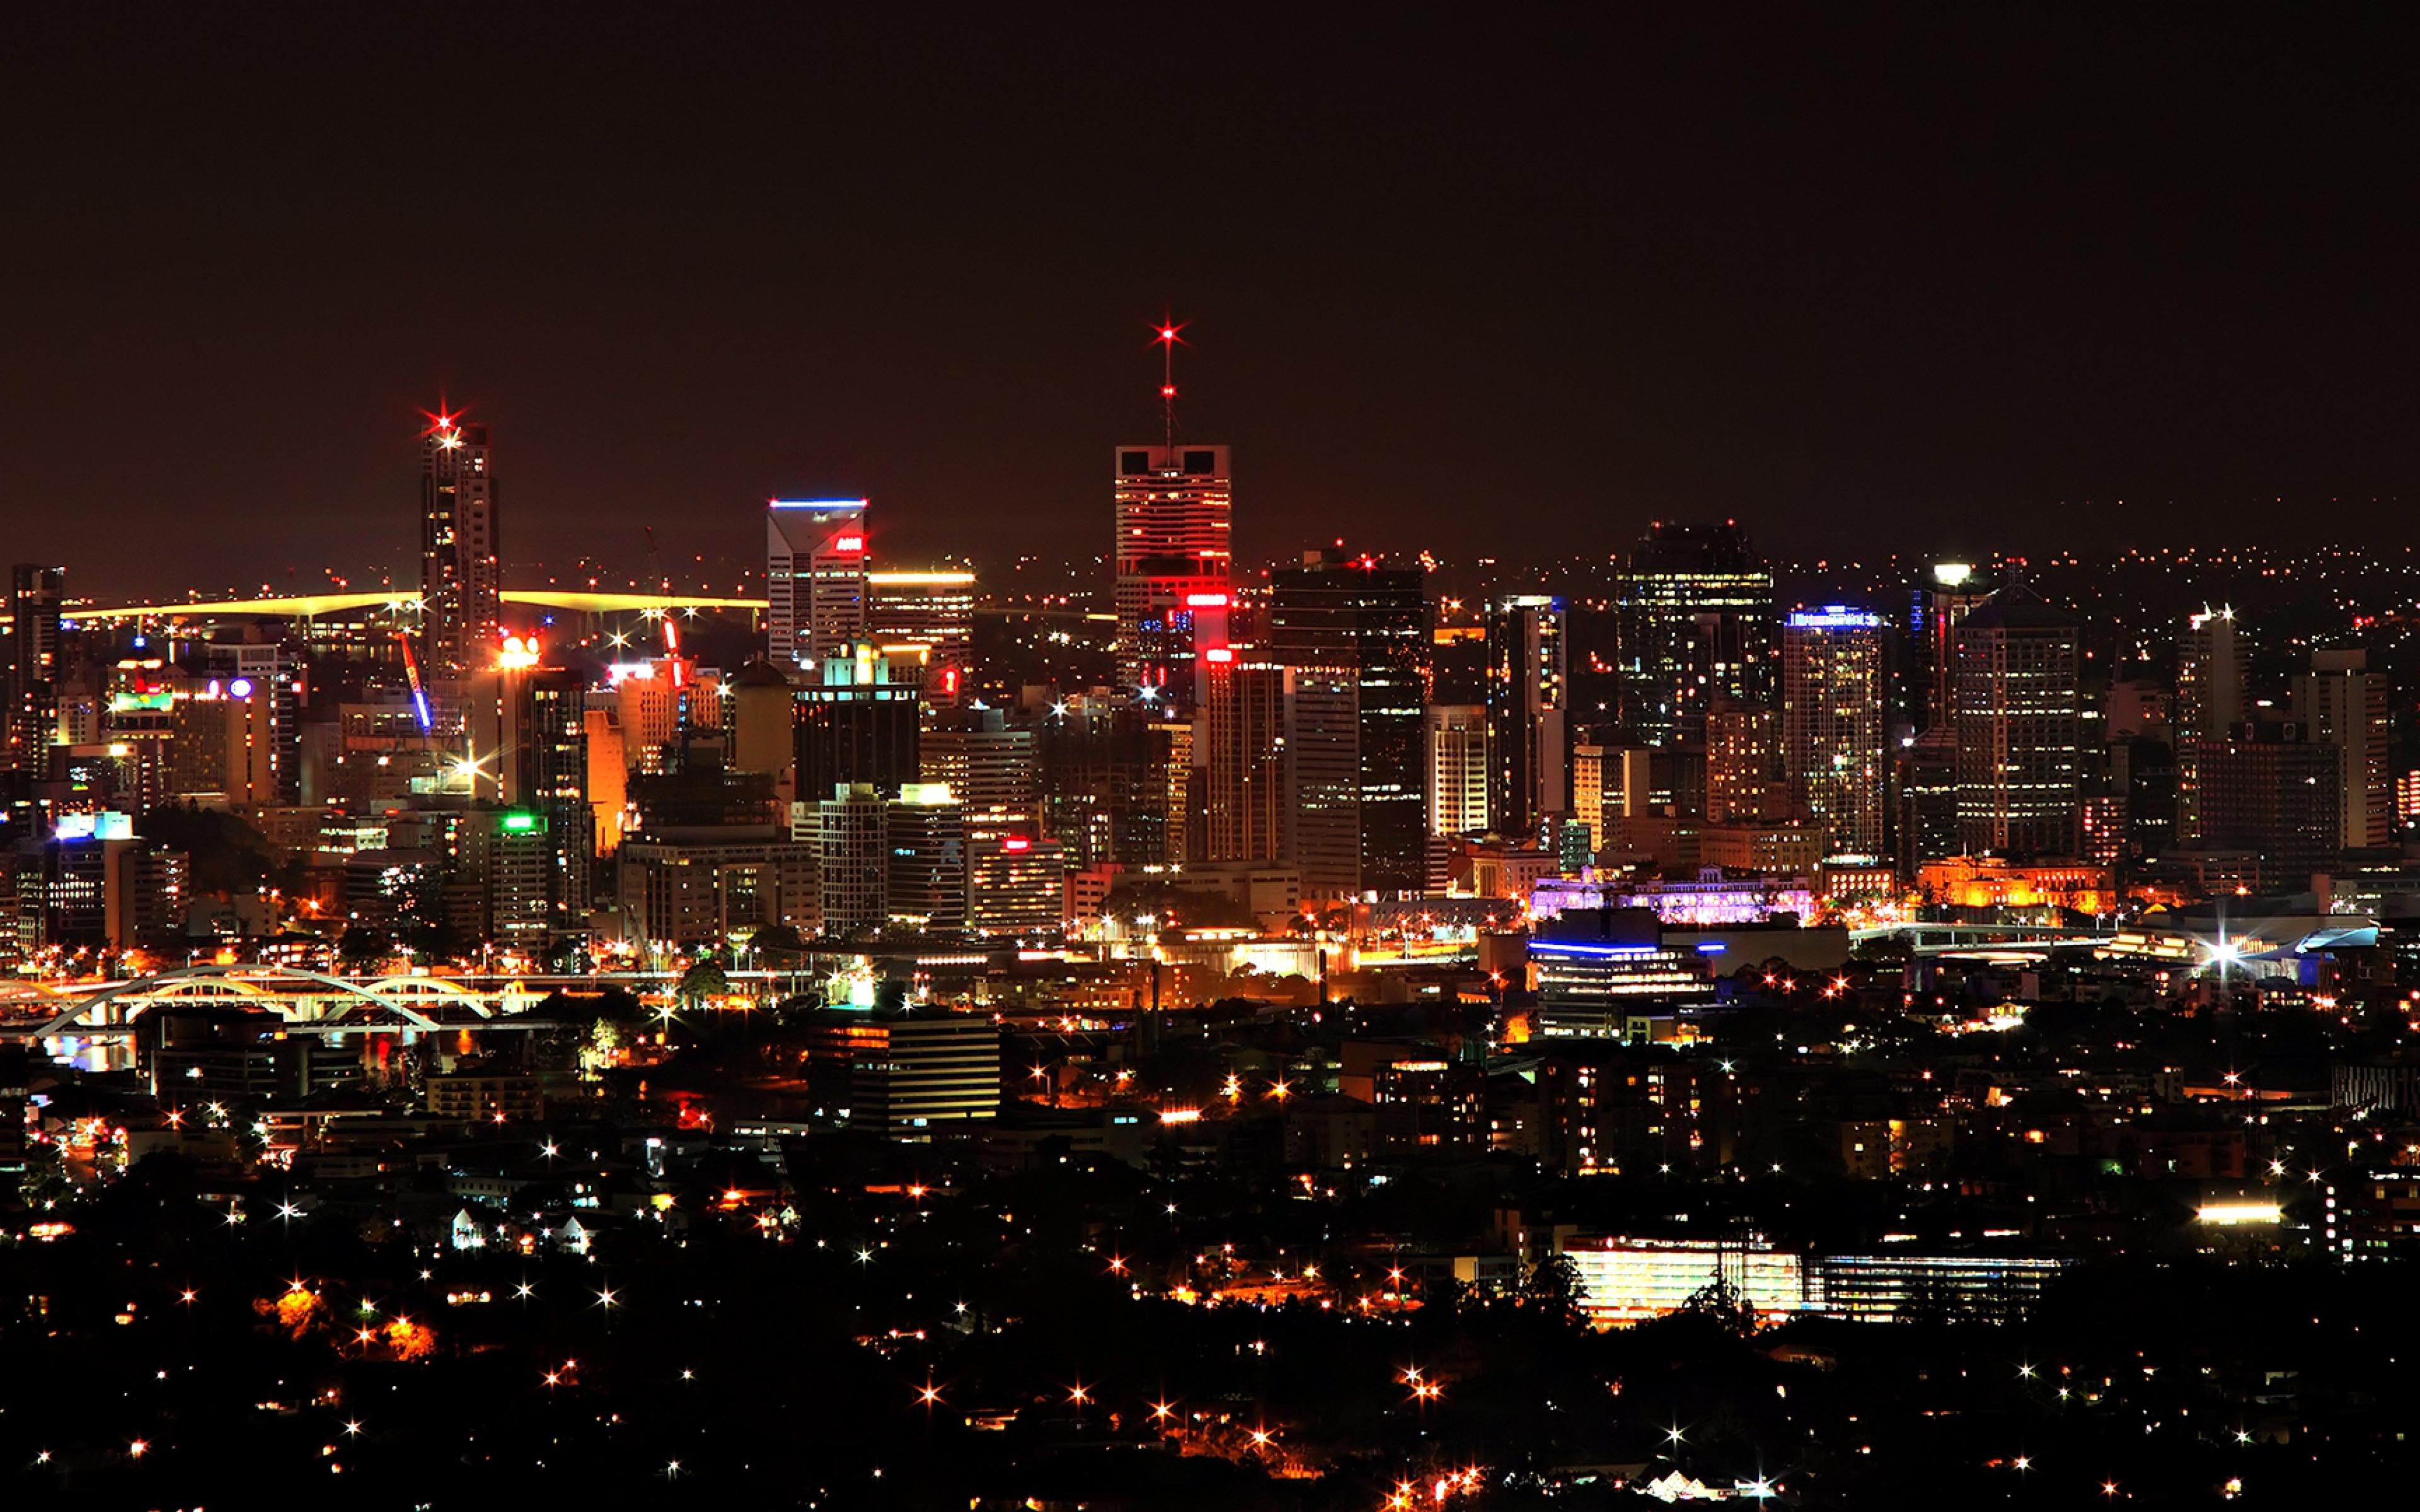 city night skyscrapers top view sky city lights 63137 3840x2400jpg 3840x2400